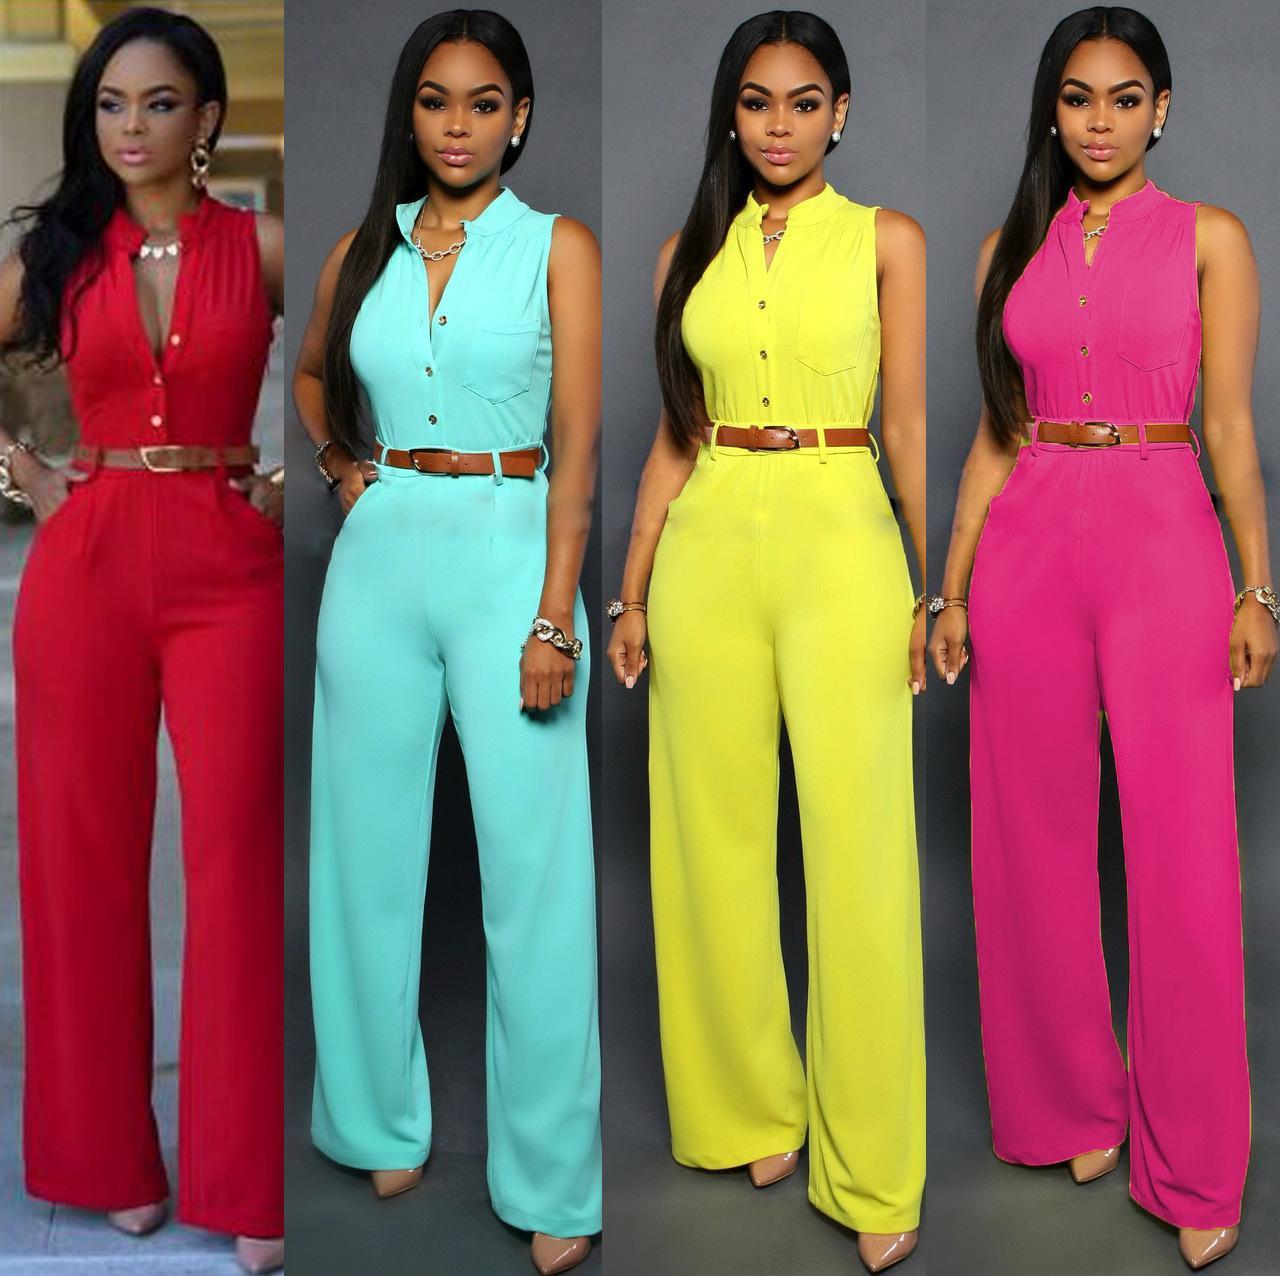 Summer OL Fashion Jumpsuits 2016 Latest Sleeveless Blouse And Long Pants  Suits Leisure Loose Women Jumpsuits In Store Stunning Women Jumpsuits  Blouse Pants ... 5aa2ec00024c